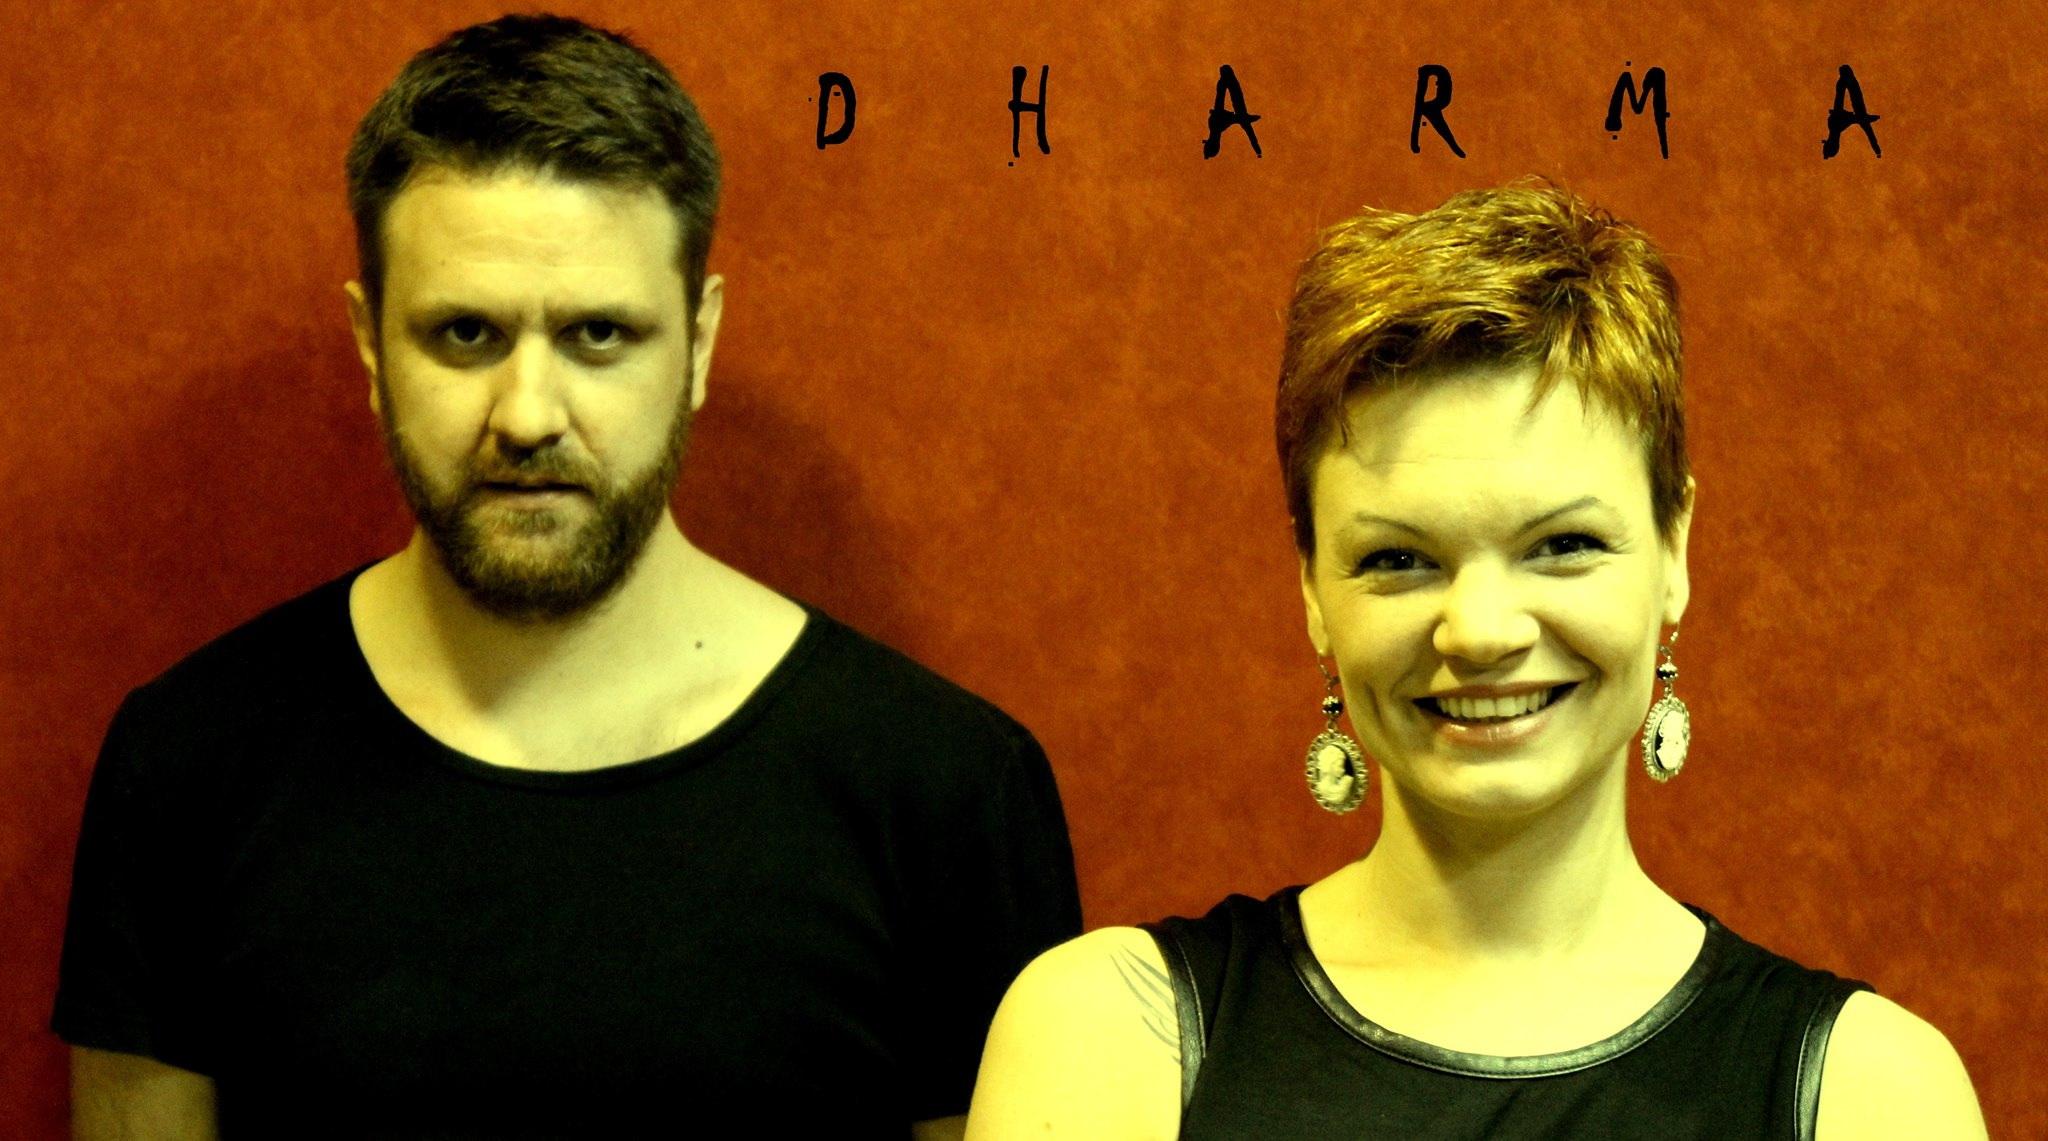 Duo Dharma